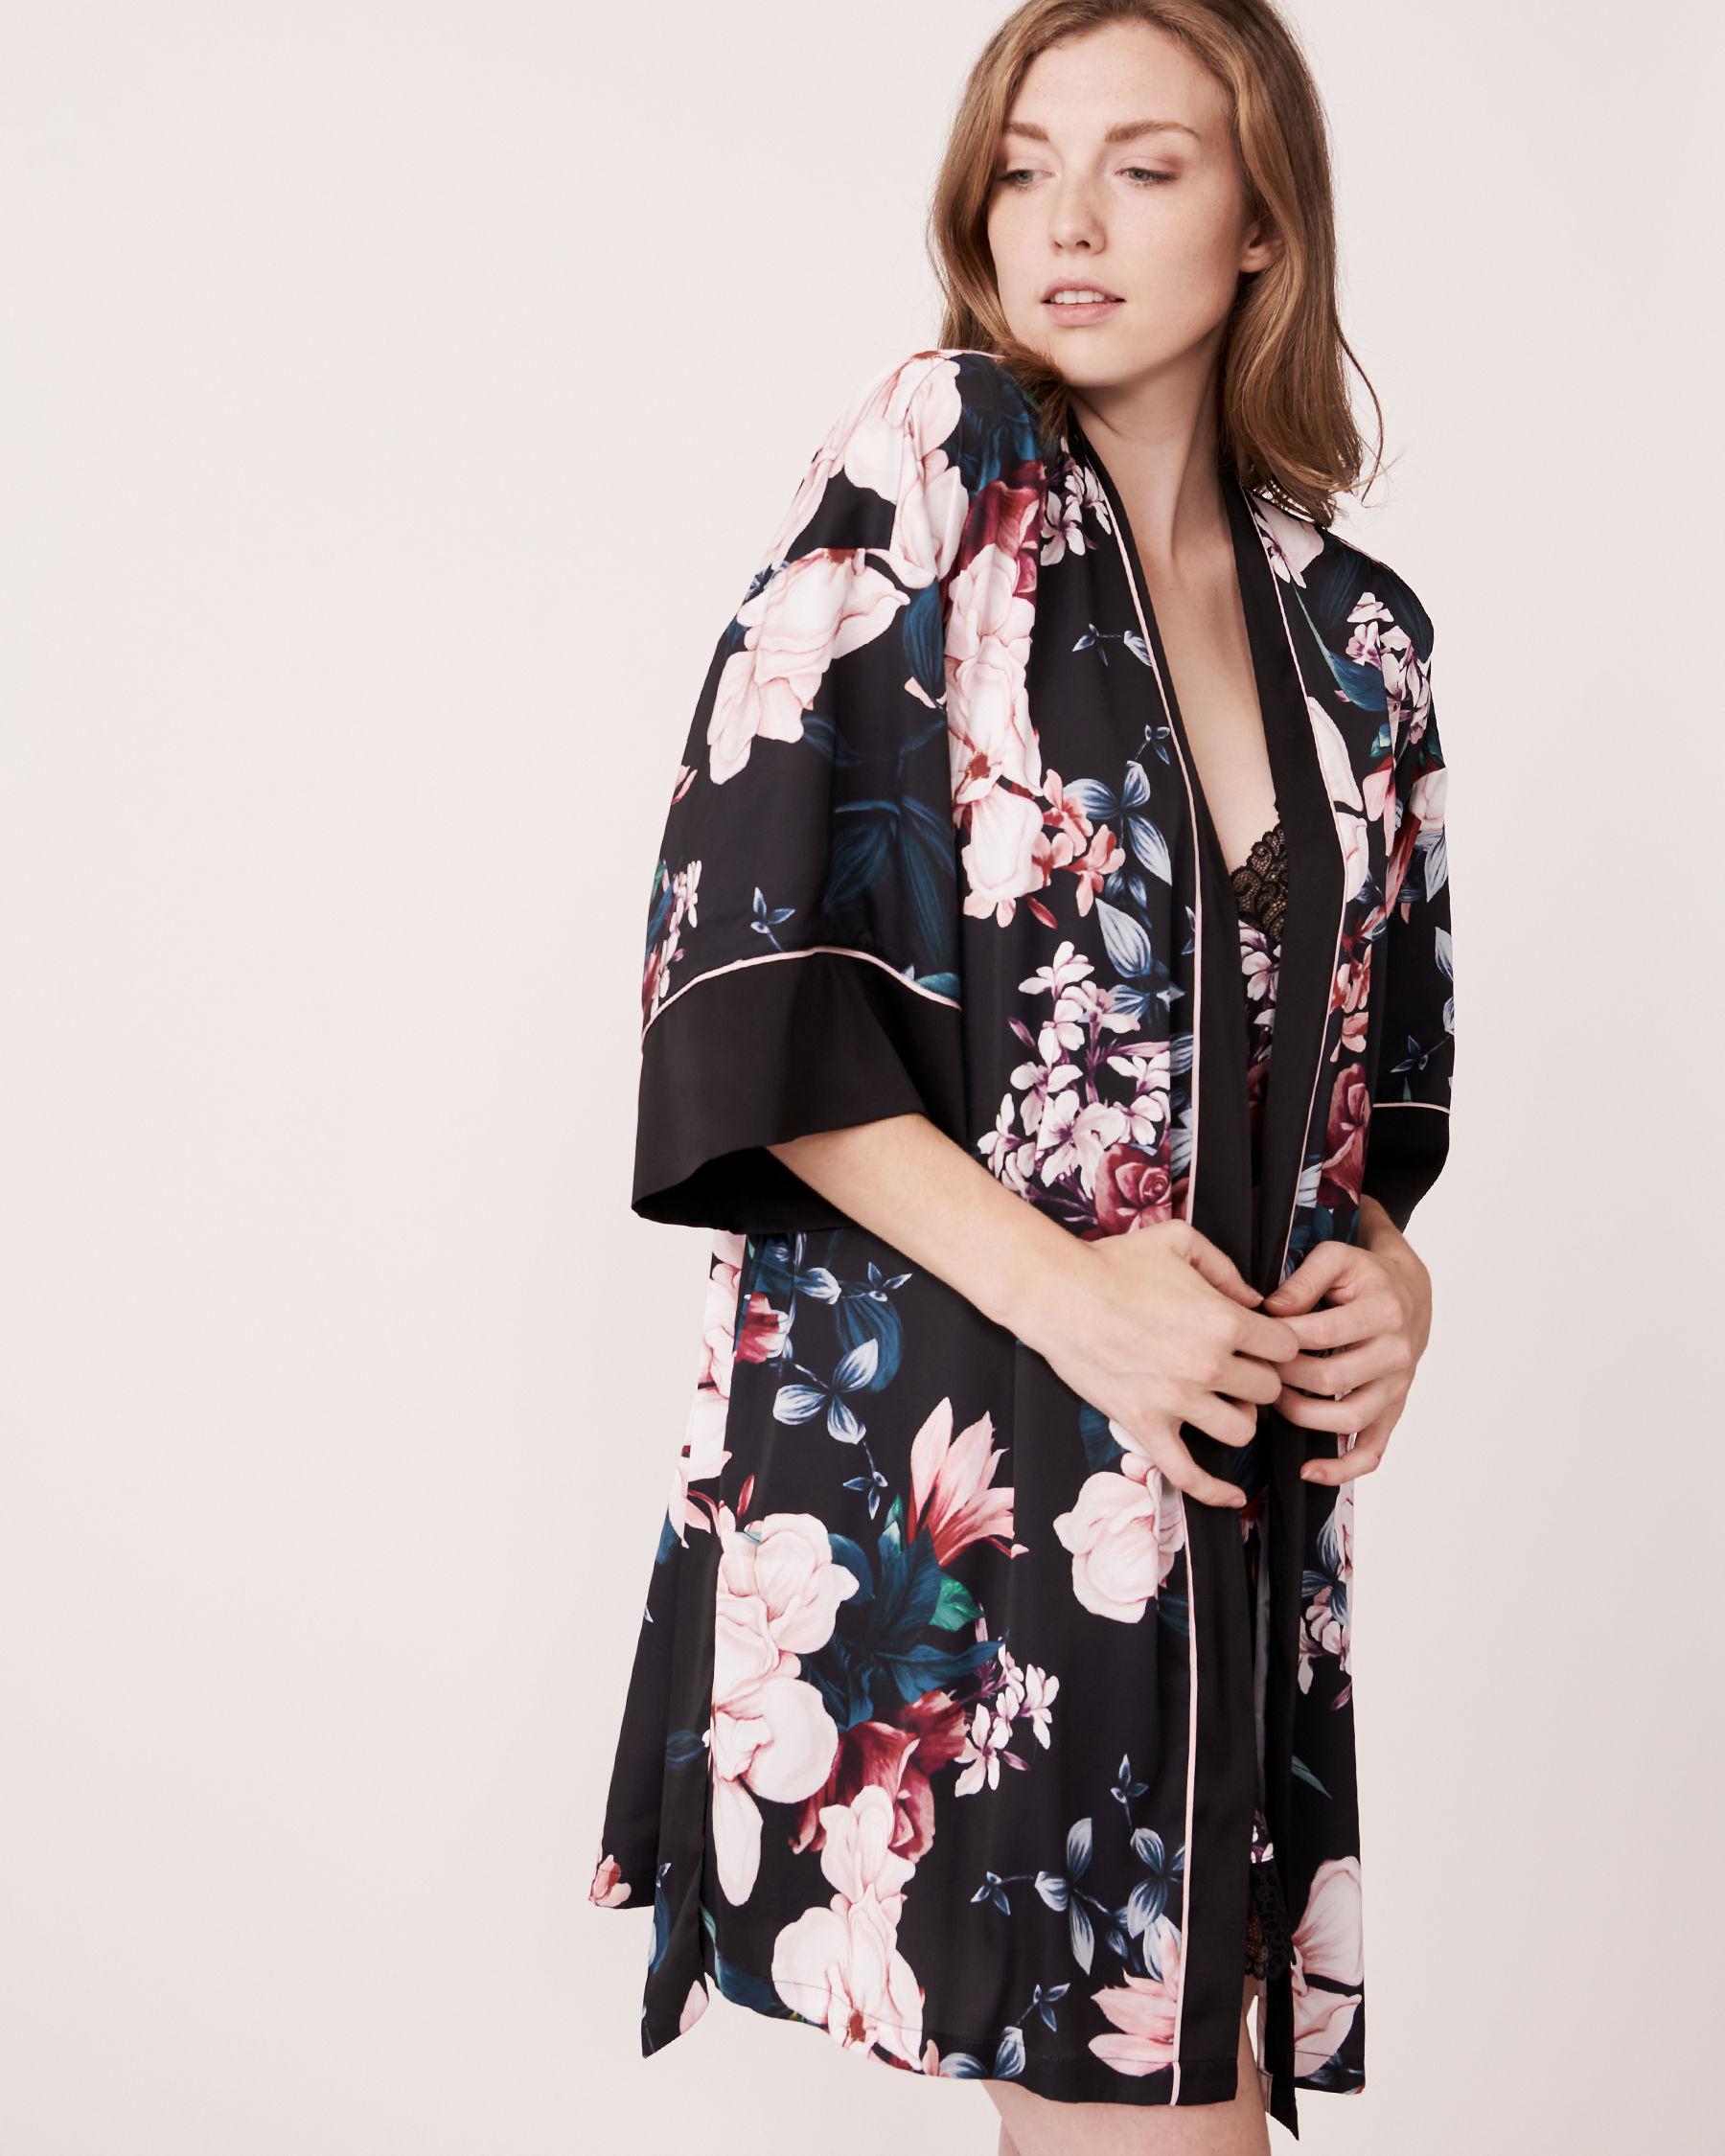 LA VIE EN ROSE Kimono en satin mat Noir 870-435-0-11 - Voir4